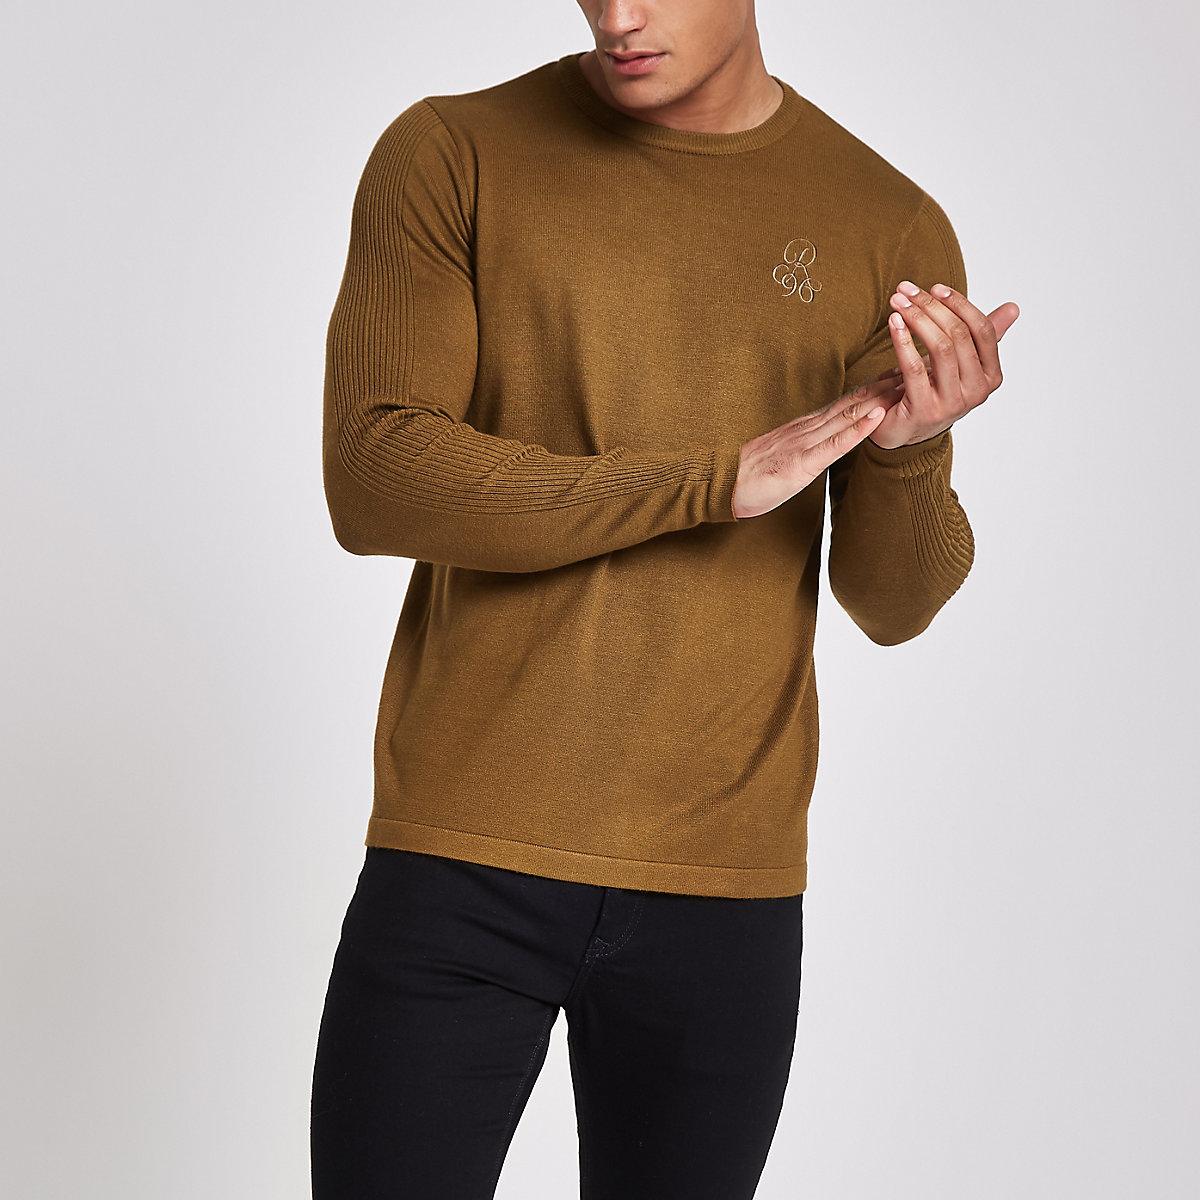 R96 green slim fit crew neck sweater